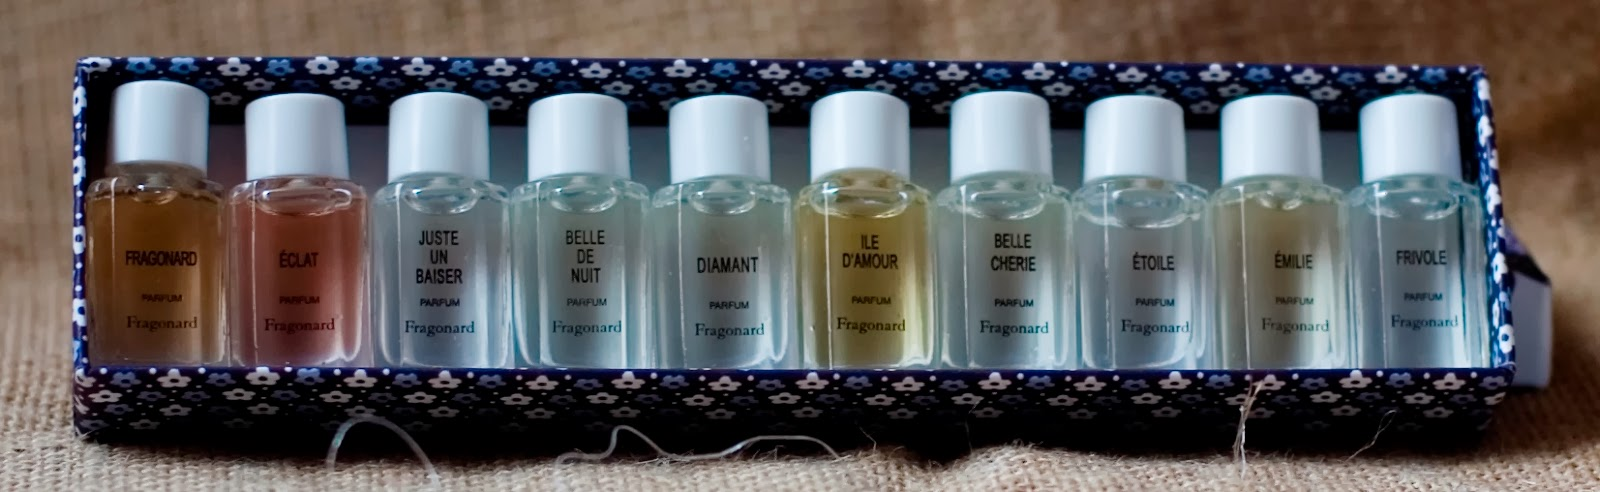 Unred Me Not Dix Parfums Set By Fragonard Parfumeur